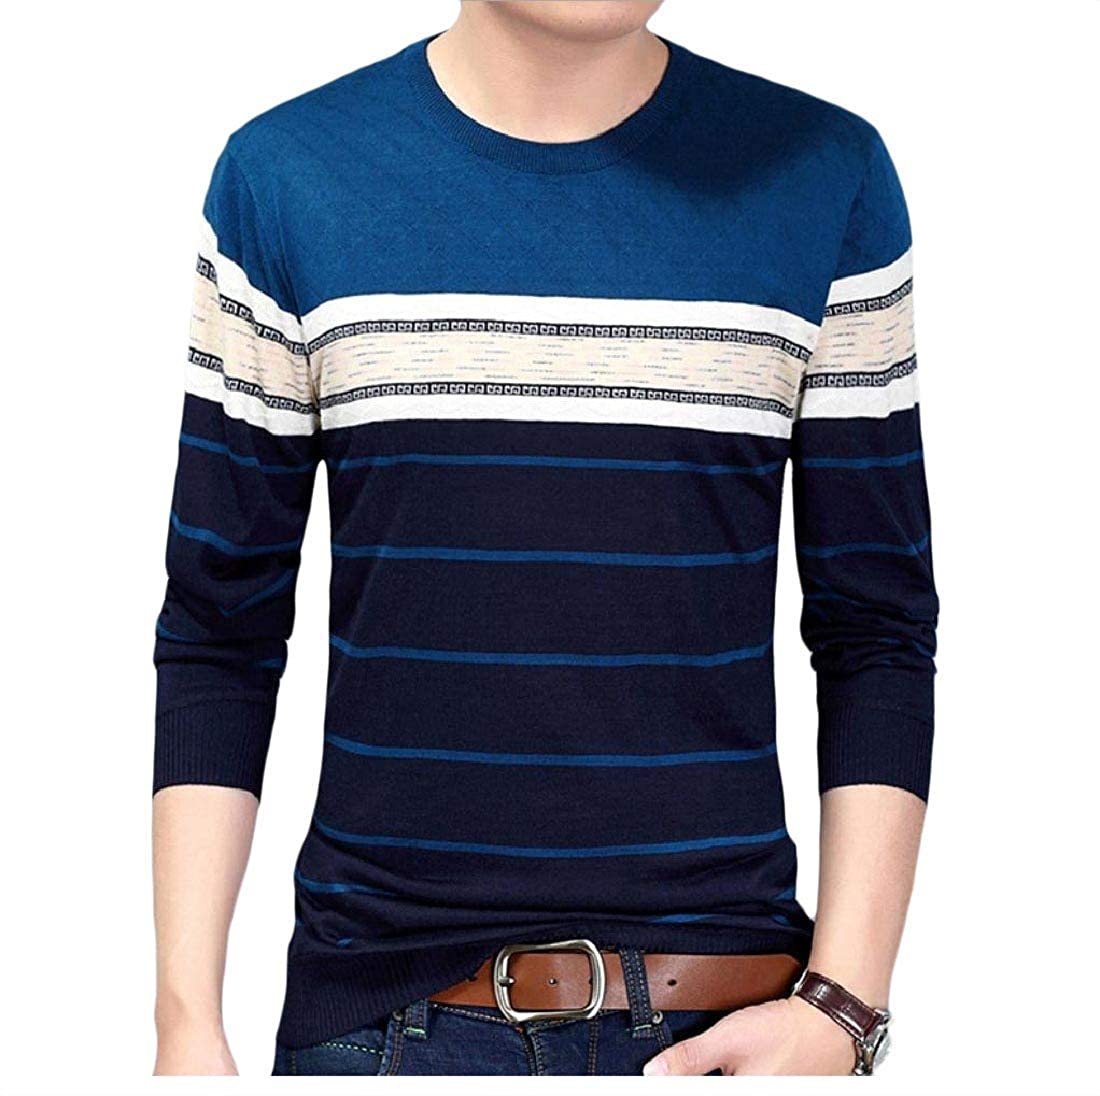 YUNY Mens Pullover Mulit Color Jacquard Knitting Ribbing Edge Sweater 17 XL